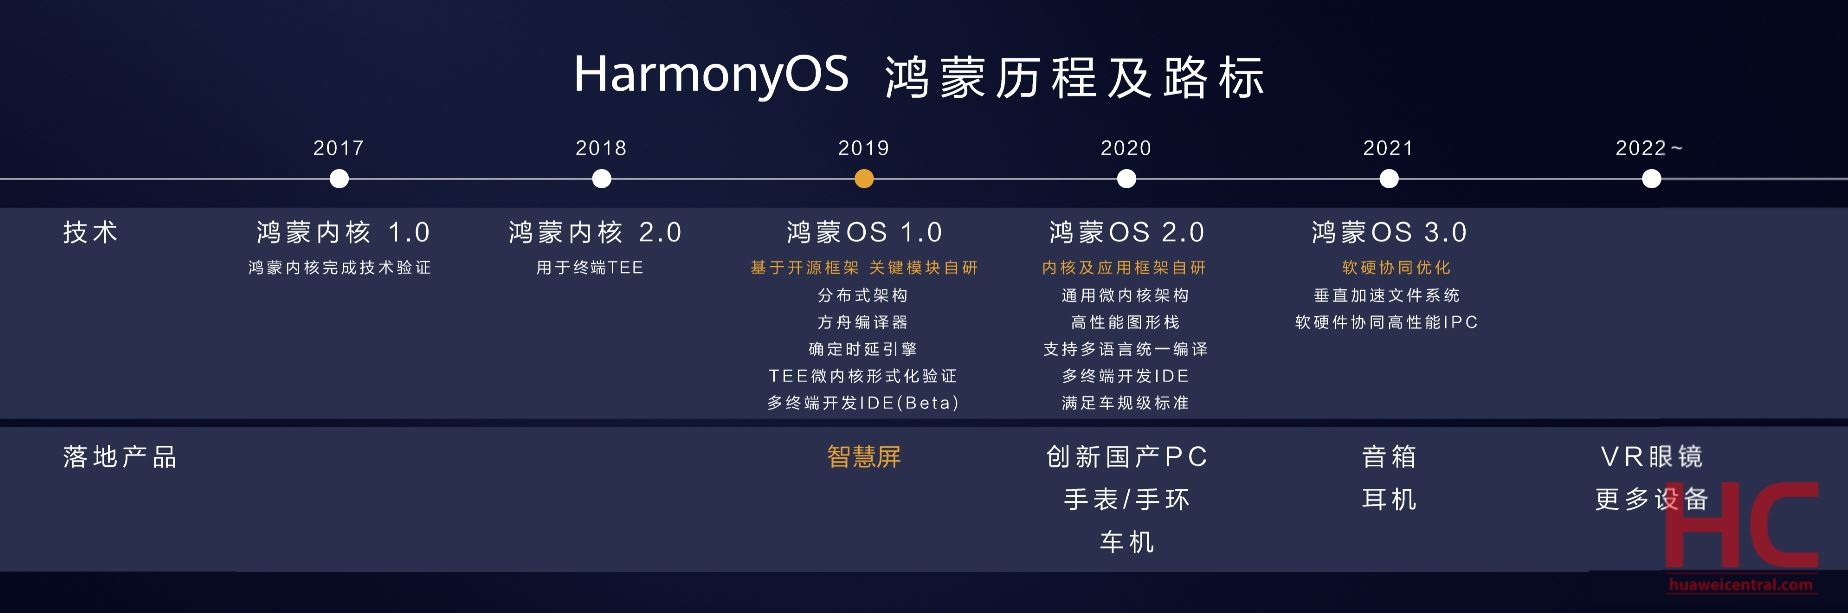 harmonyos 2 timeline